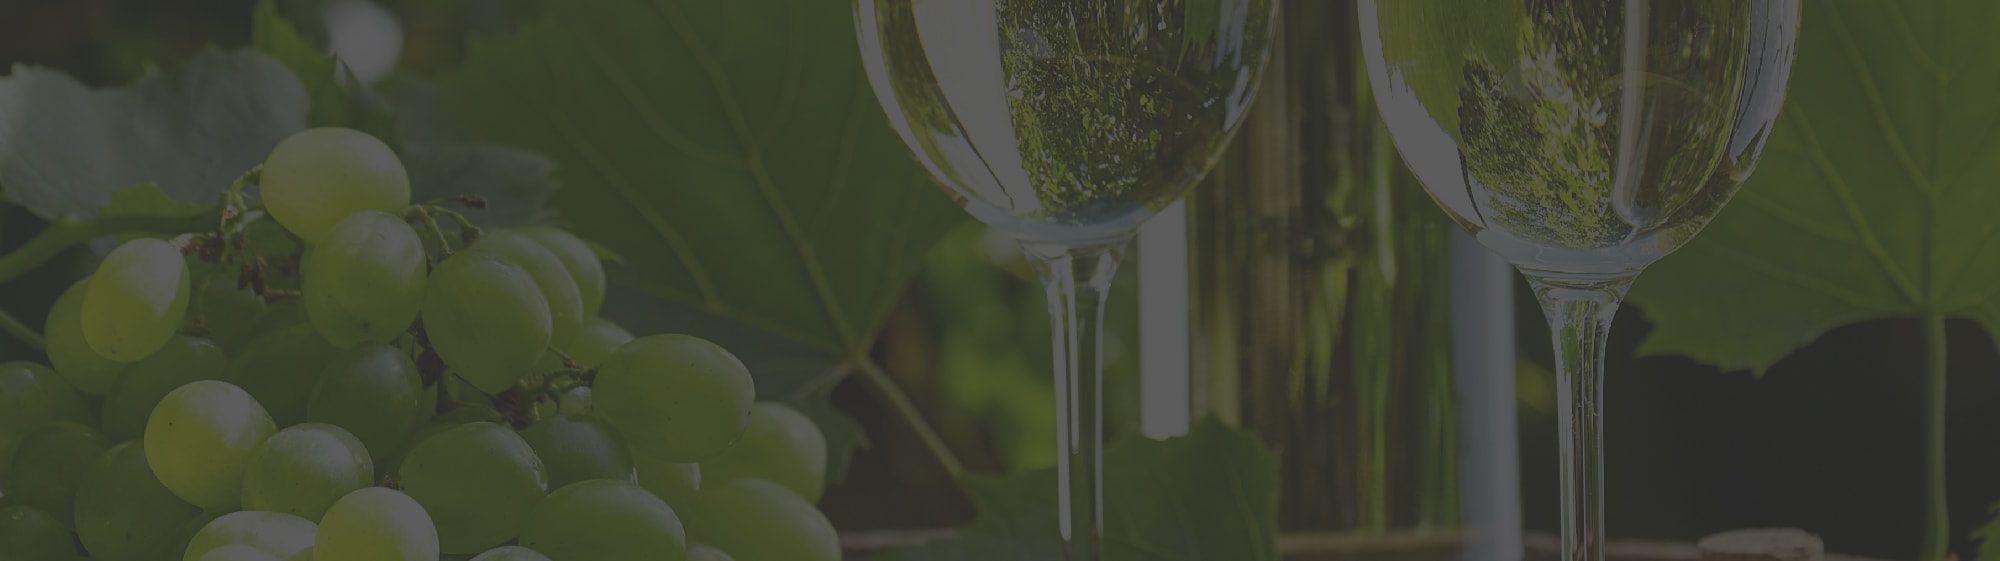 vinospirit-banner